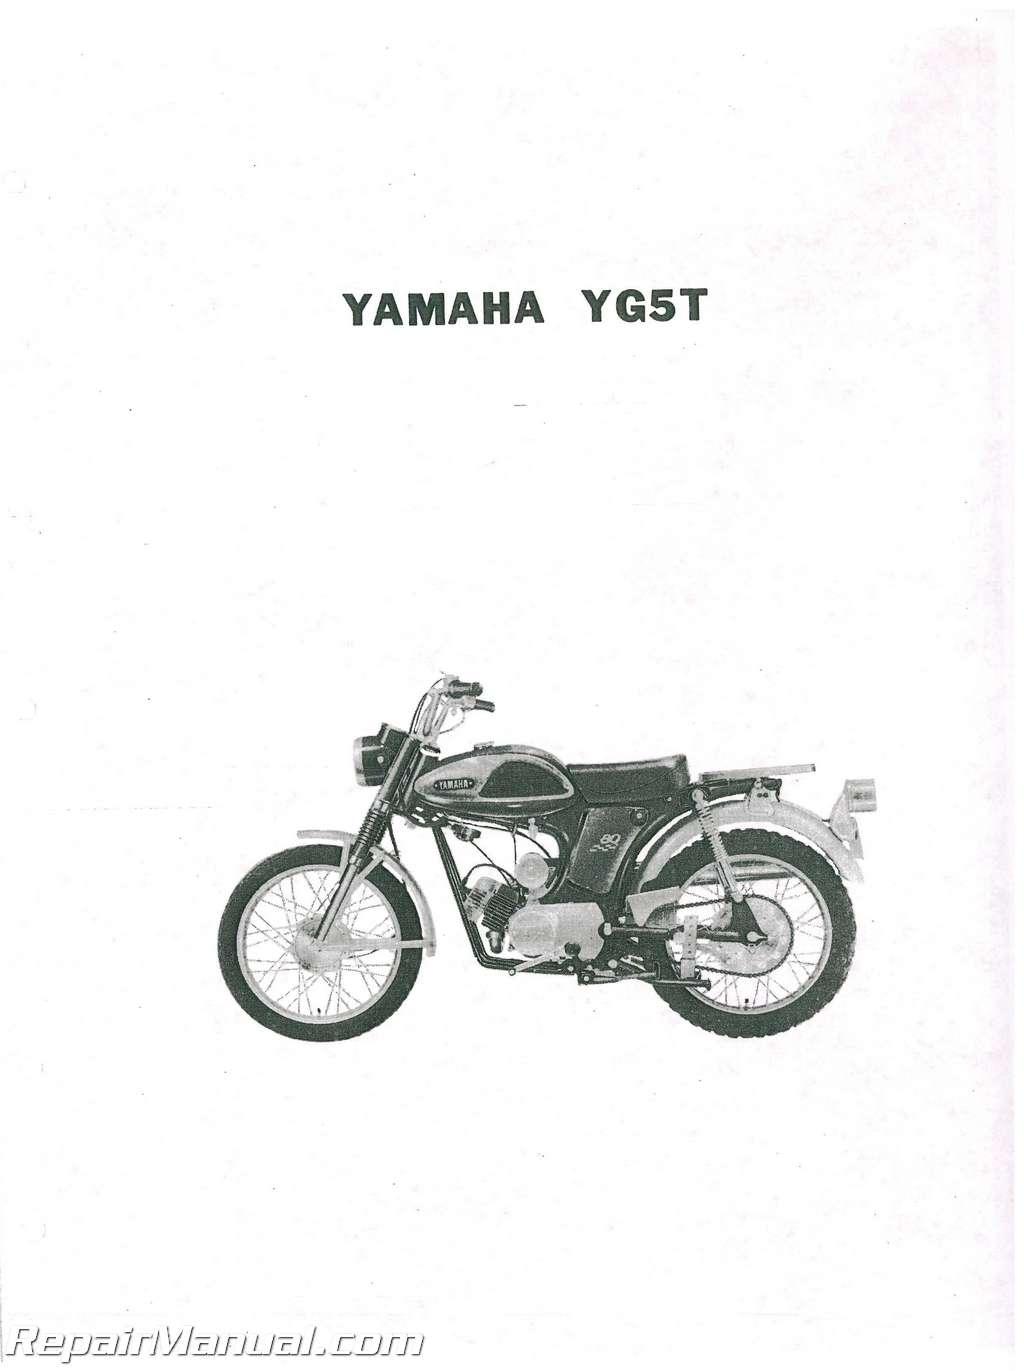 1969 yamaha yg5t trailmaster 80 parts manual